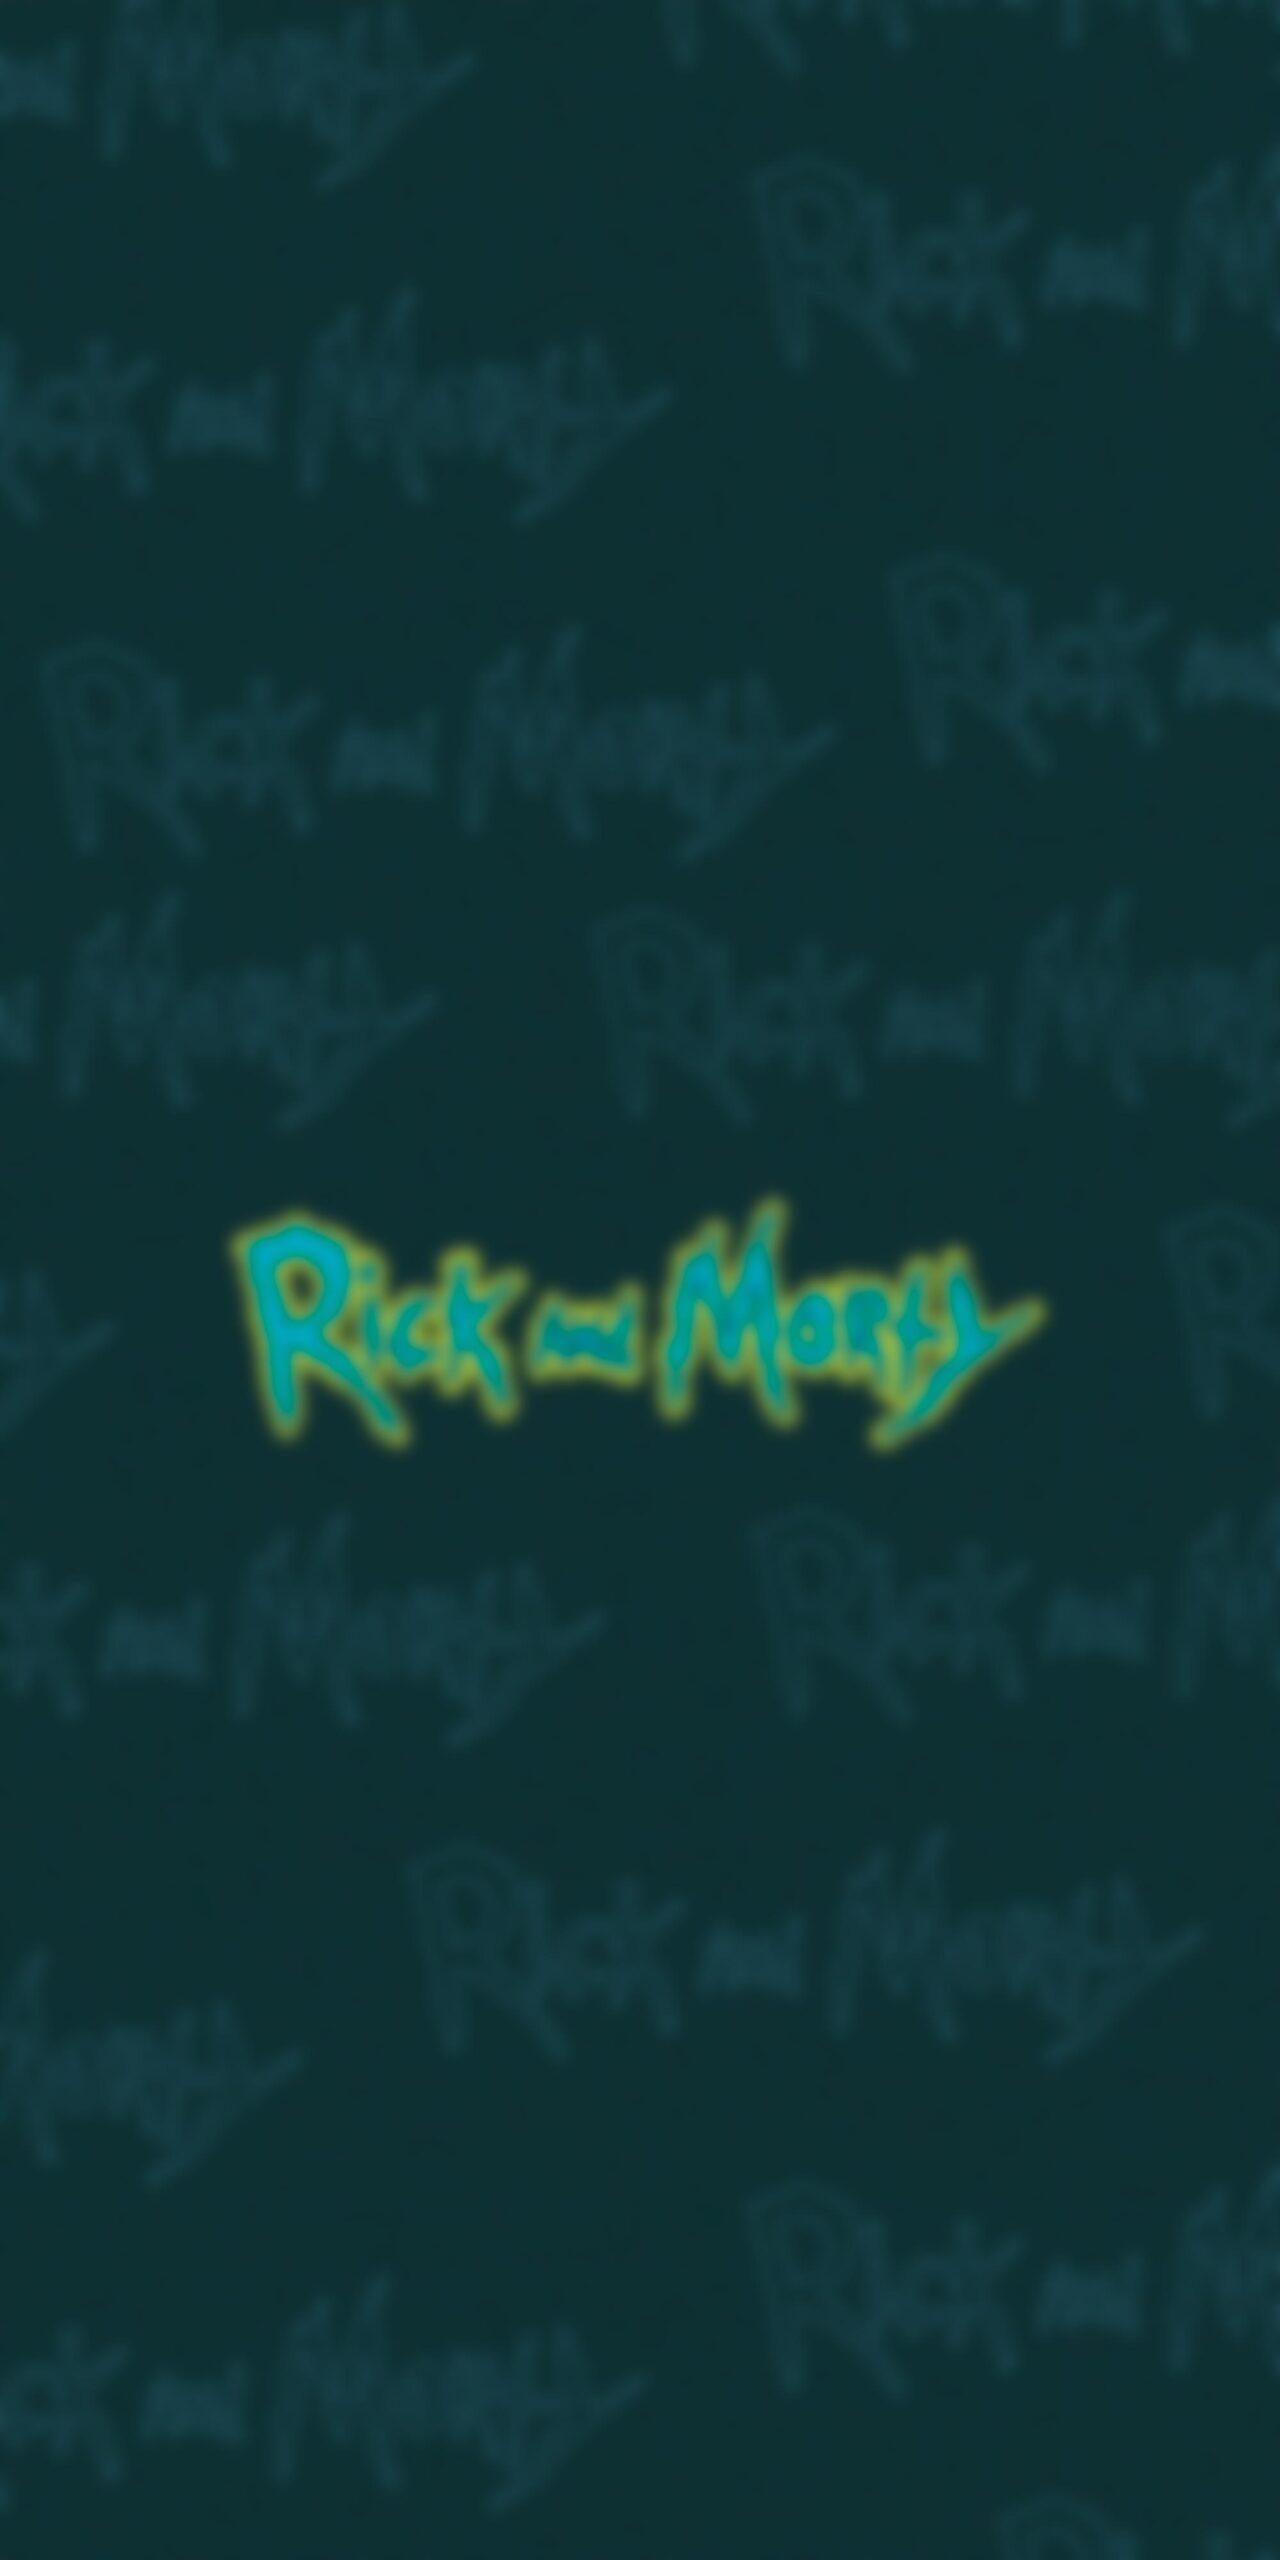 rick and morty logo blue blur wallpaper